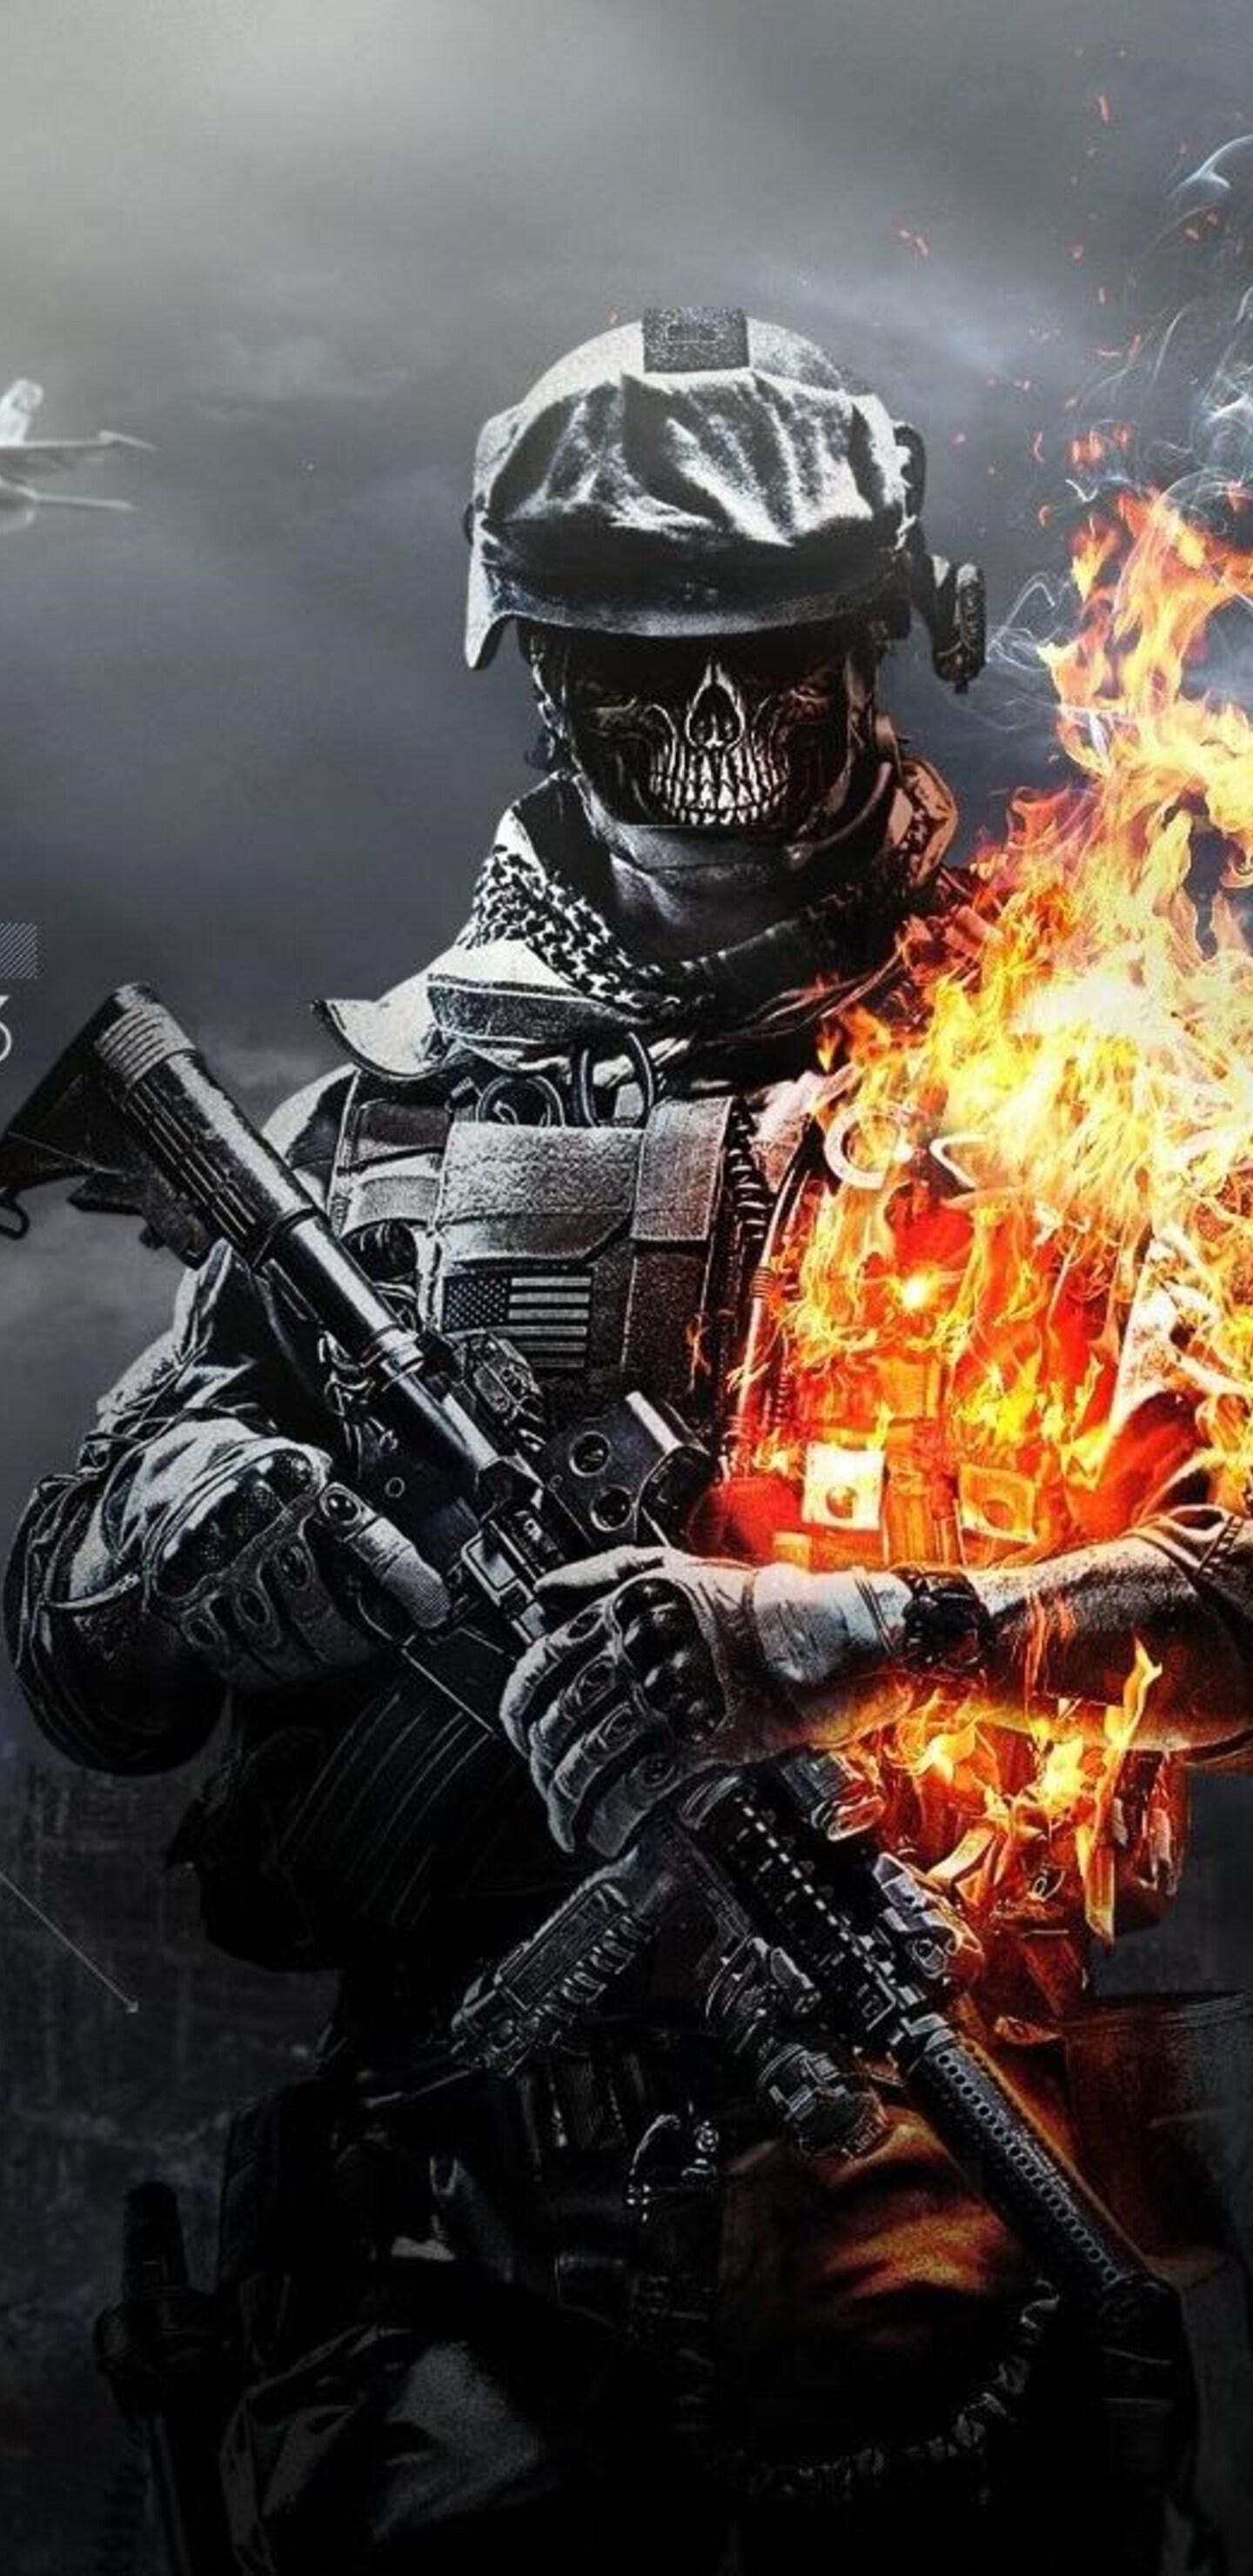 1440x2960 Battlefield Game Samsung Galaxy Note 9 8 S9 S8 S8 Qhd Hd